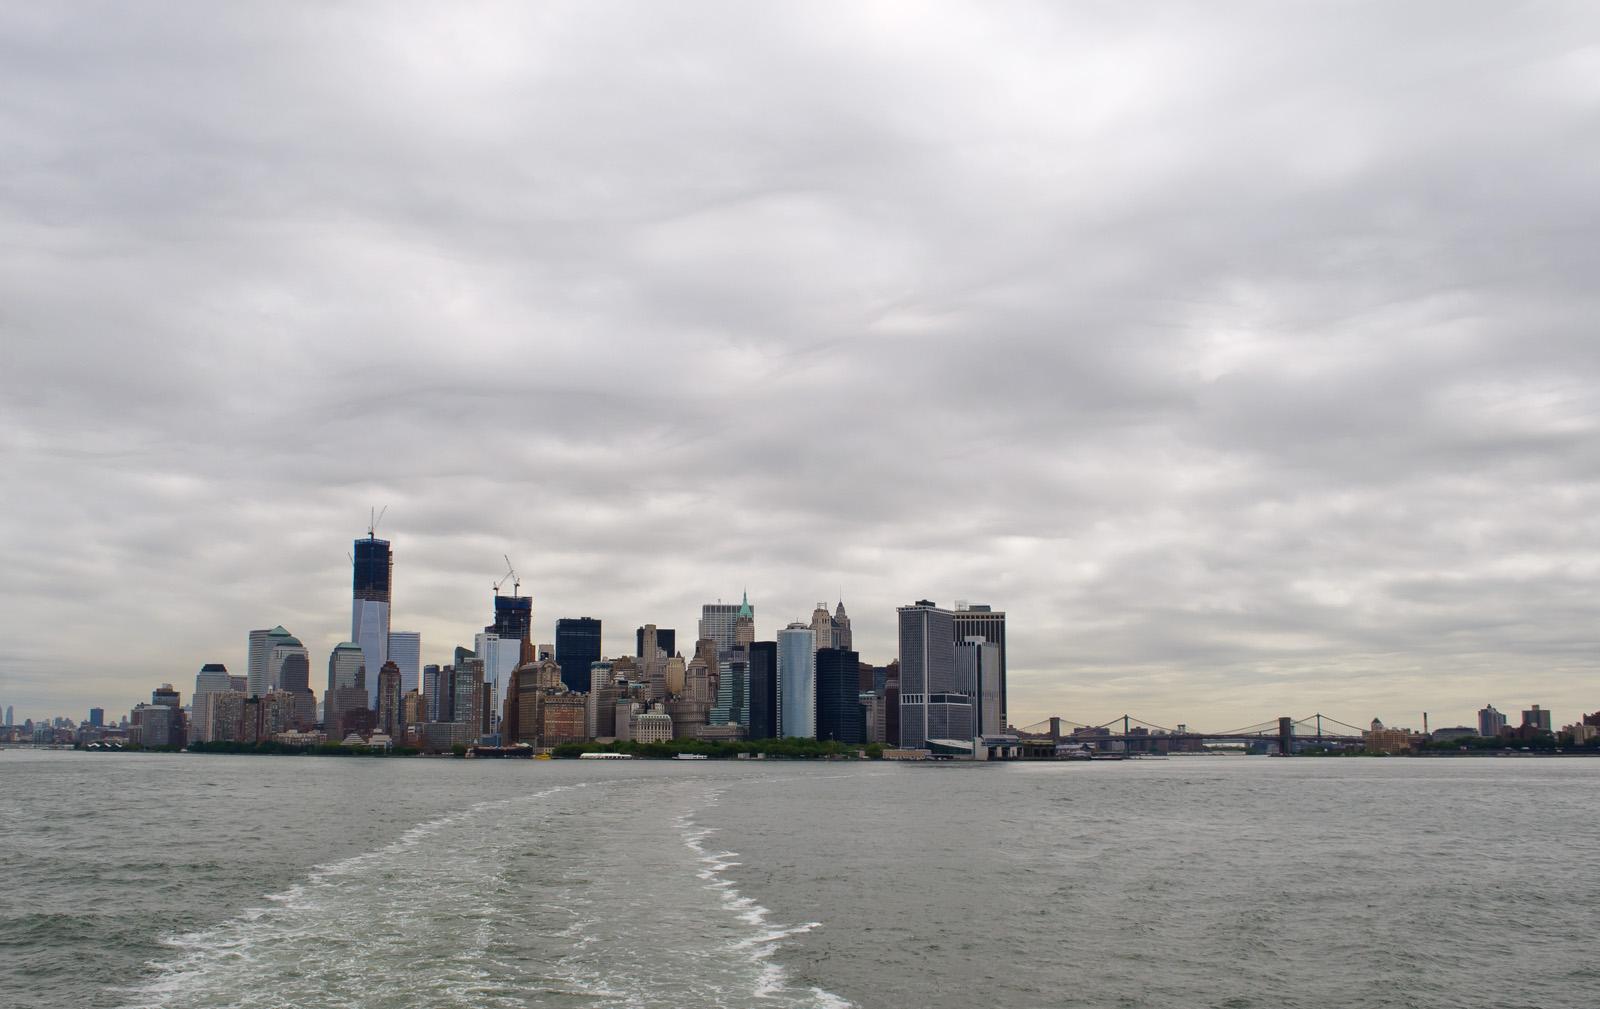 File:Lower Manhattan from Staten Island Ferry (7208224434 ...